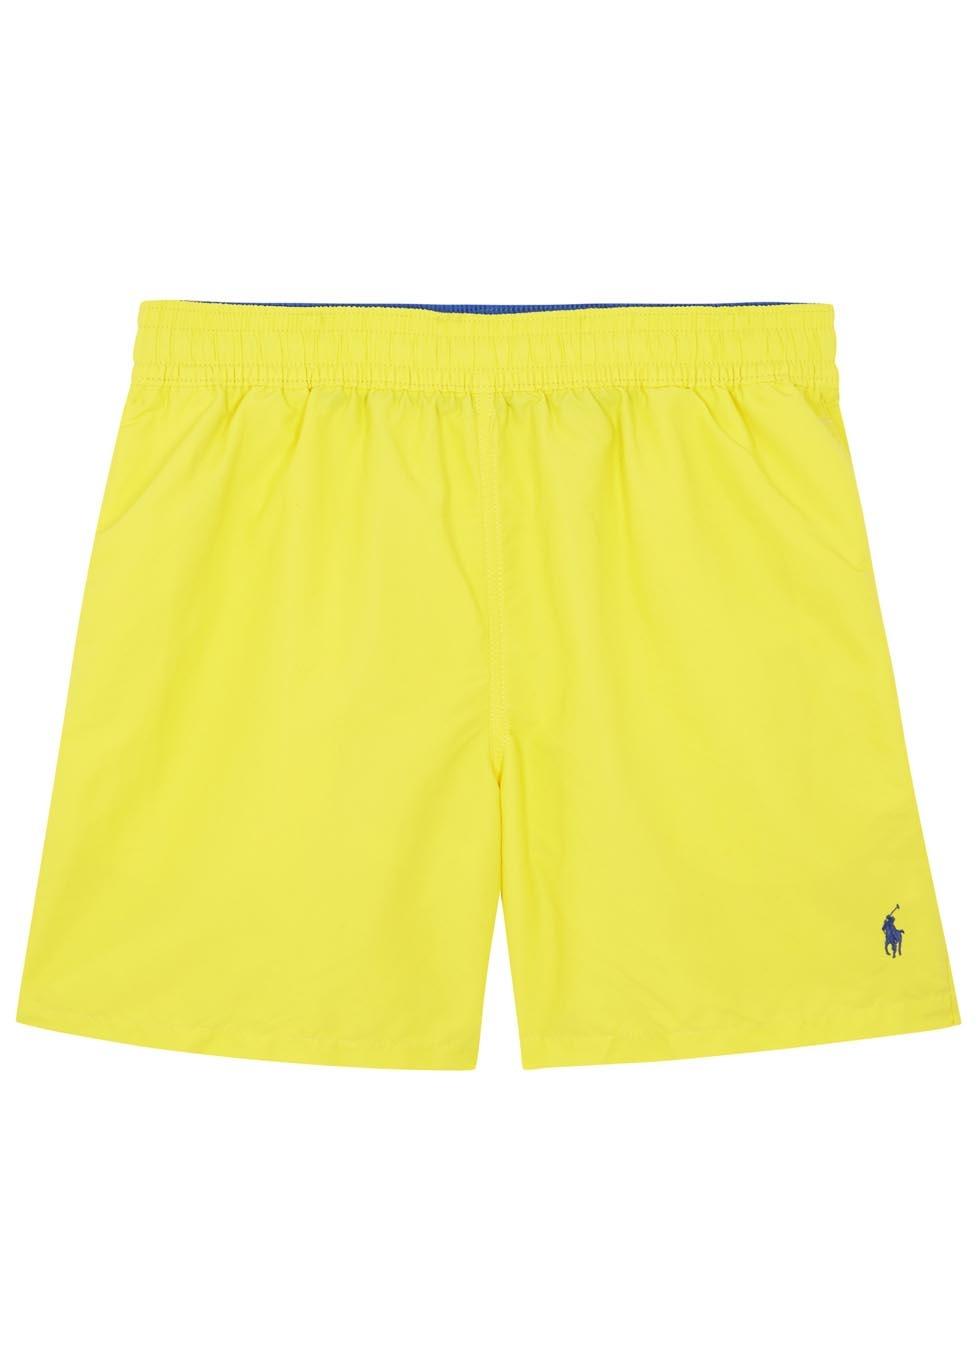 a9bfc4b6 Polo Ralph Lauren Hawaiian Bright Yellow Swim Shorts in Yellow for ...